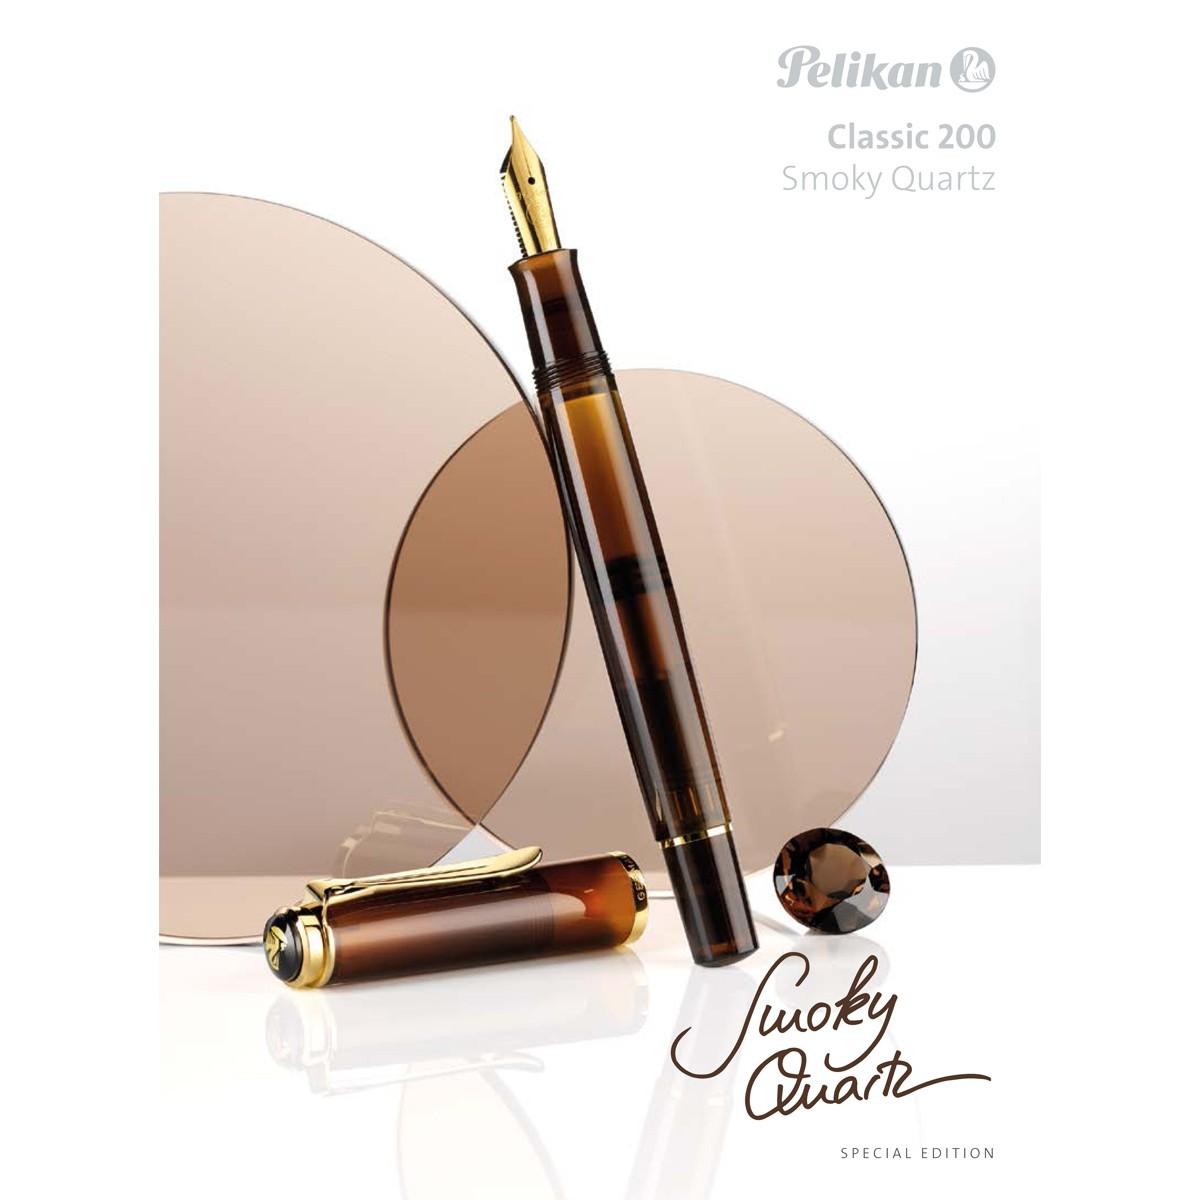 Pelikan - M200 Smoky Quartz / Ink - Stilografica